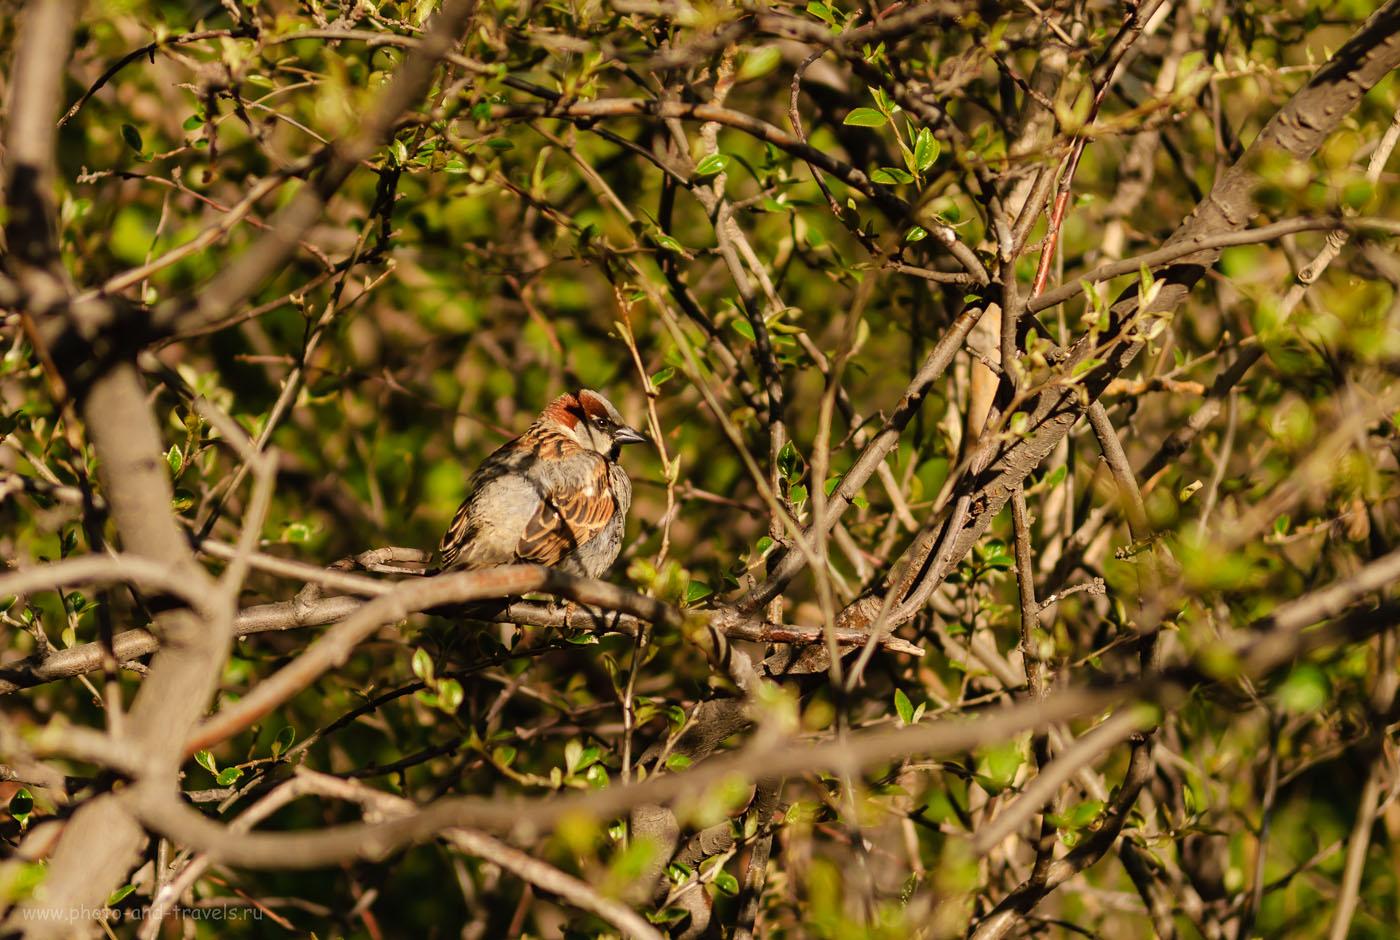 8. Пример фото на Nikon D200 и зум Nikon 17-55mm f/2.8 при съемке диких птиц. 1/750, 2.8, 100, 55.